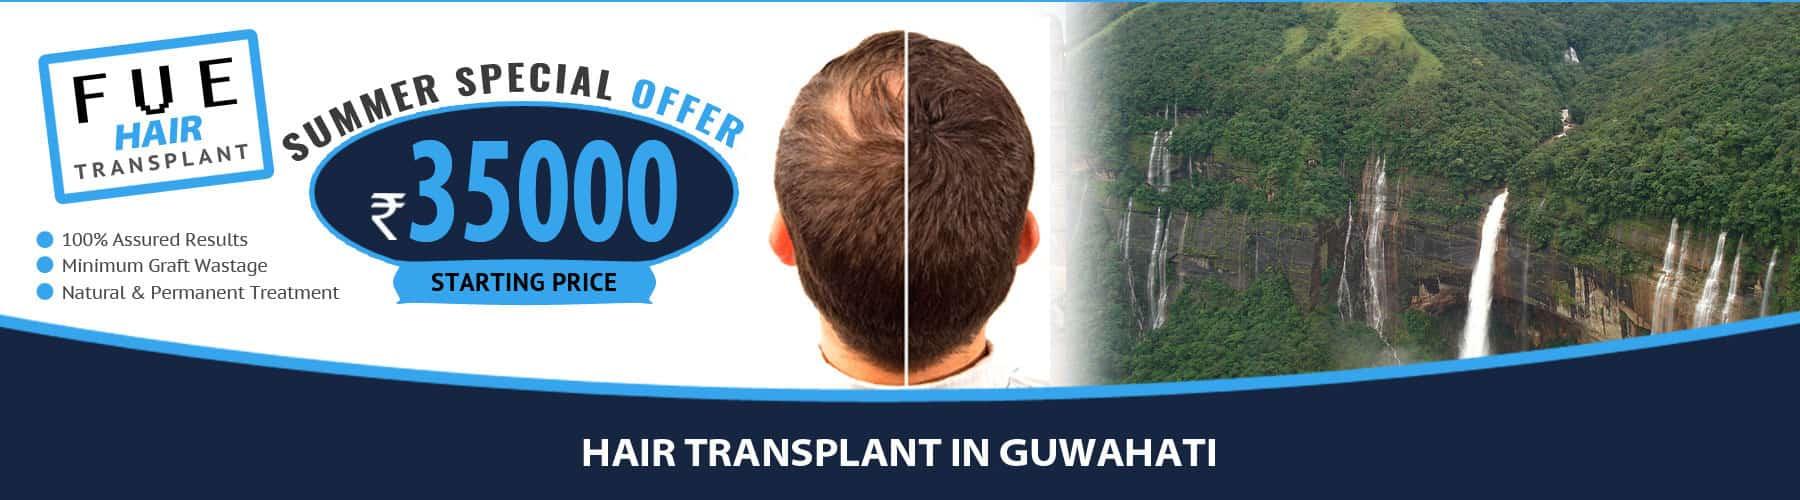 Hair Transplant Guwahati